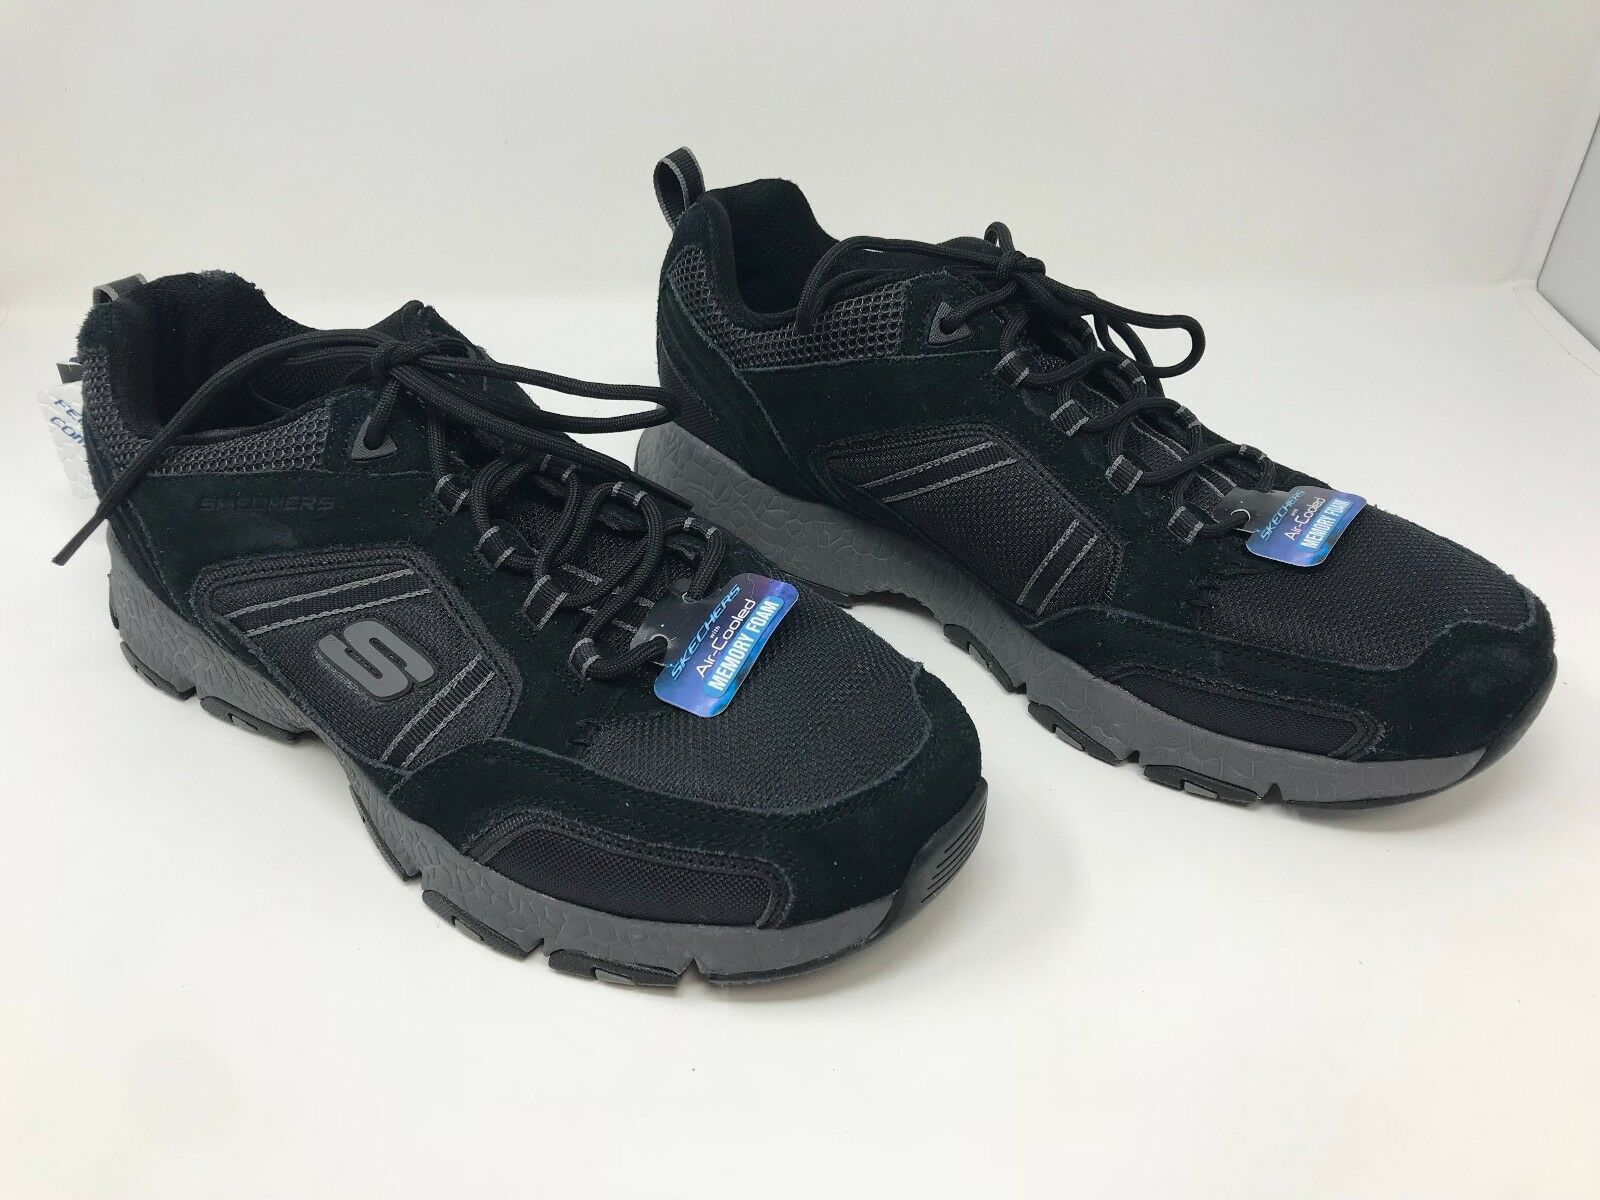 New! Men's Skechers 51580 Sports Burst Tech Sneakers Black/Gray F25 best-selling model of the brand